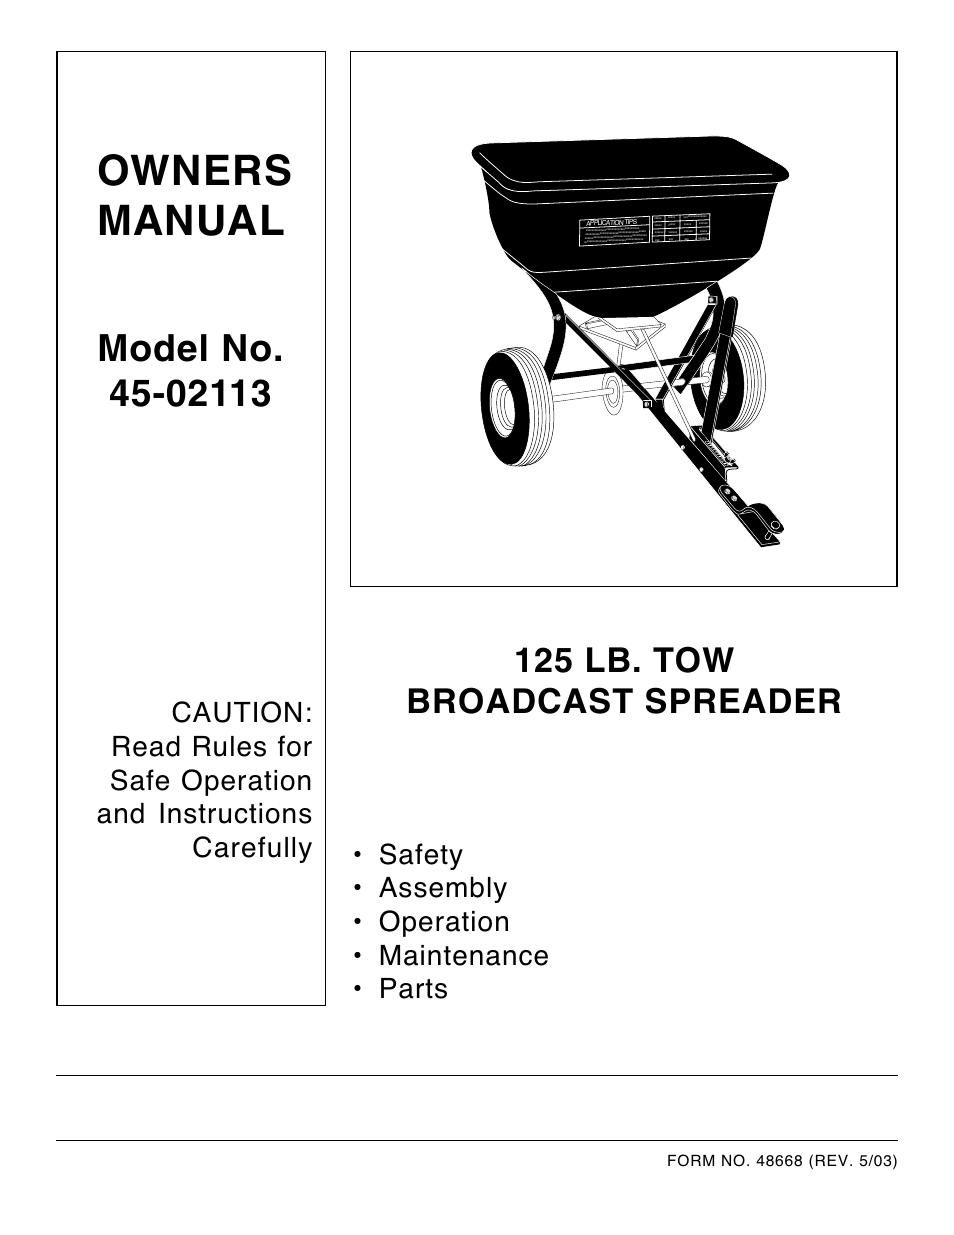 agri fab 45 02113 user manual 12 pages rh manualsdir com Agri-Fab Broadcast Spreader agri fab broadcast spreader 100 manual